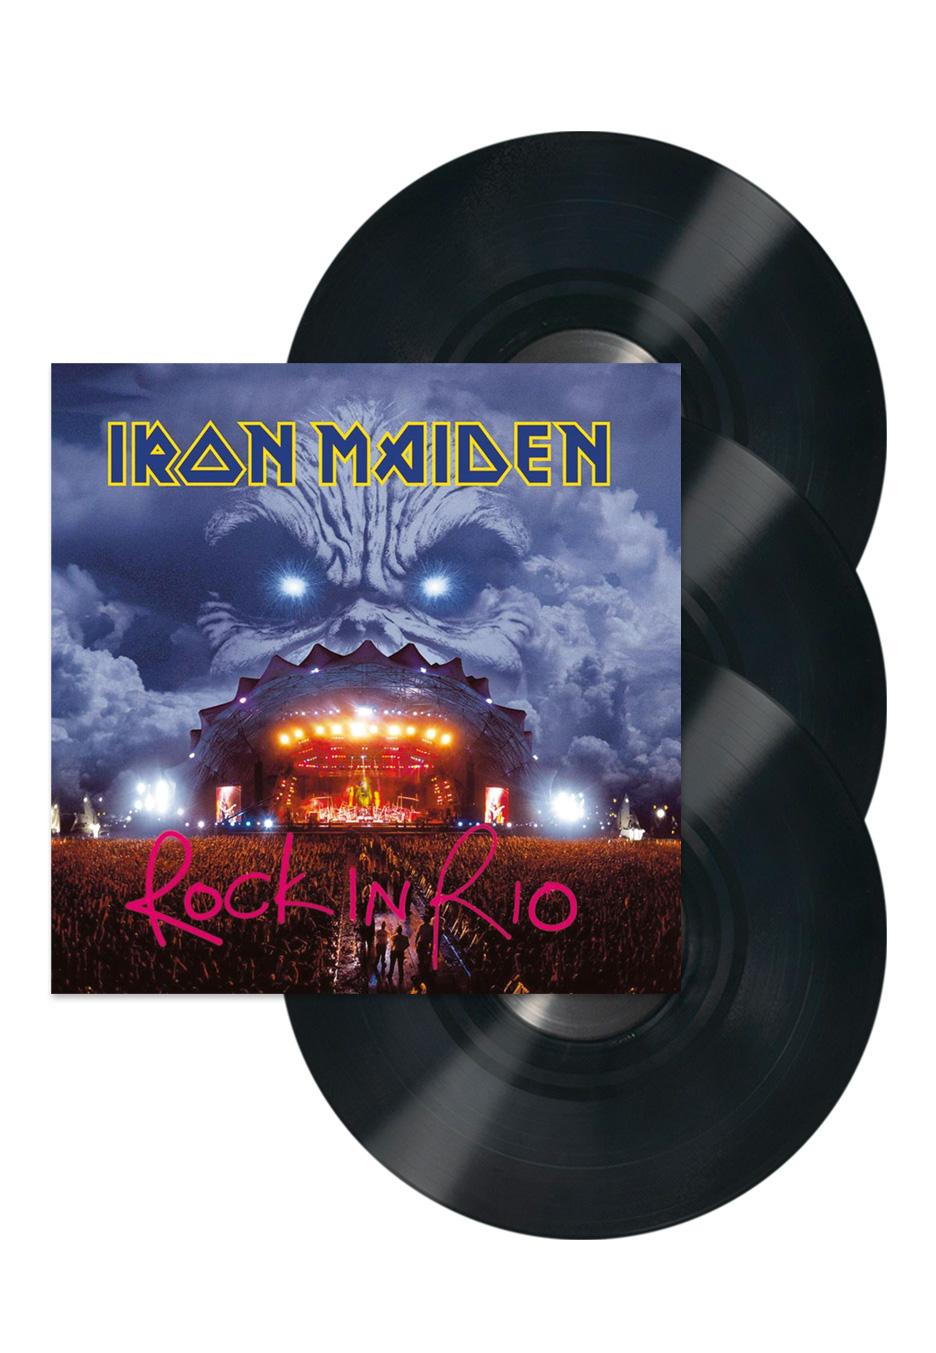 Iron Maiden - Rock In Rio (Live) - Vinyl